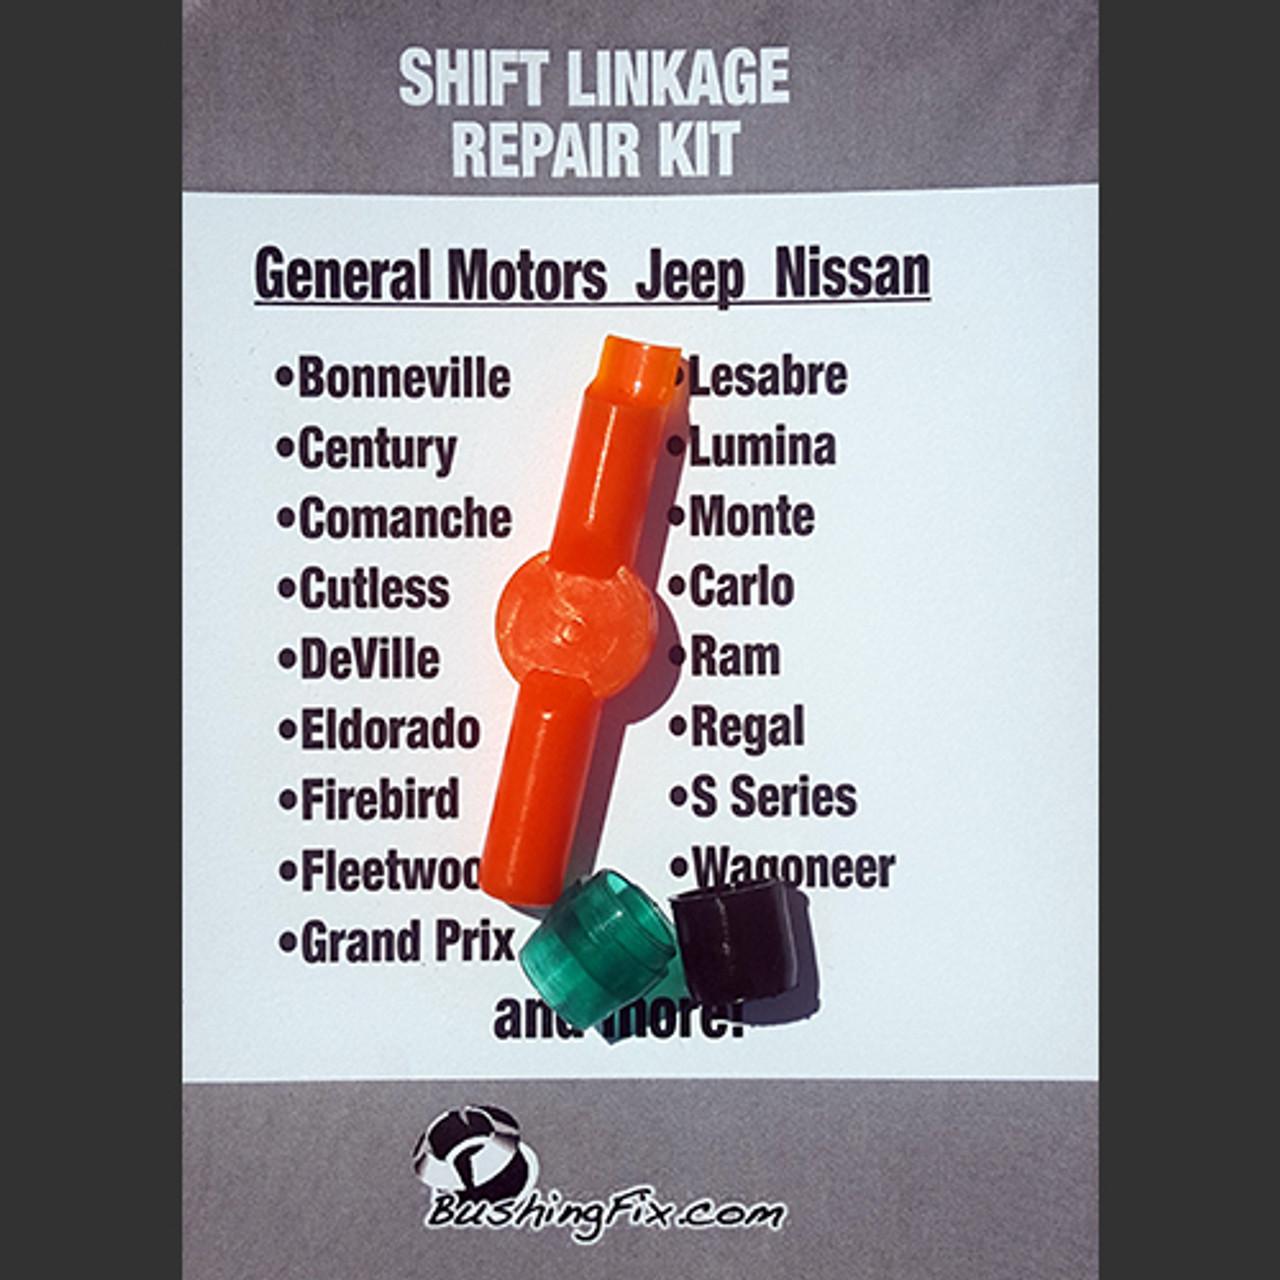 Chevrolet Impala bushing repair kit